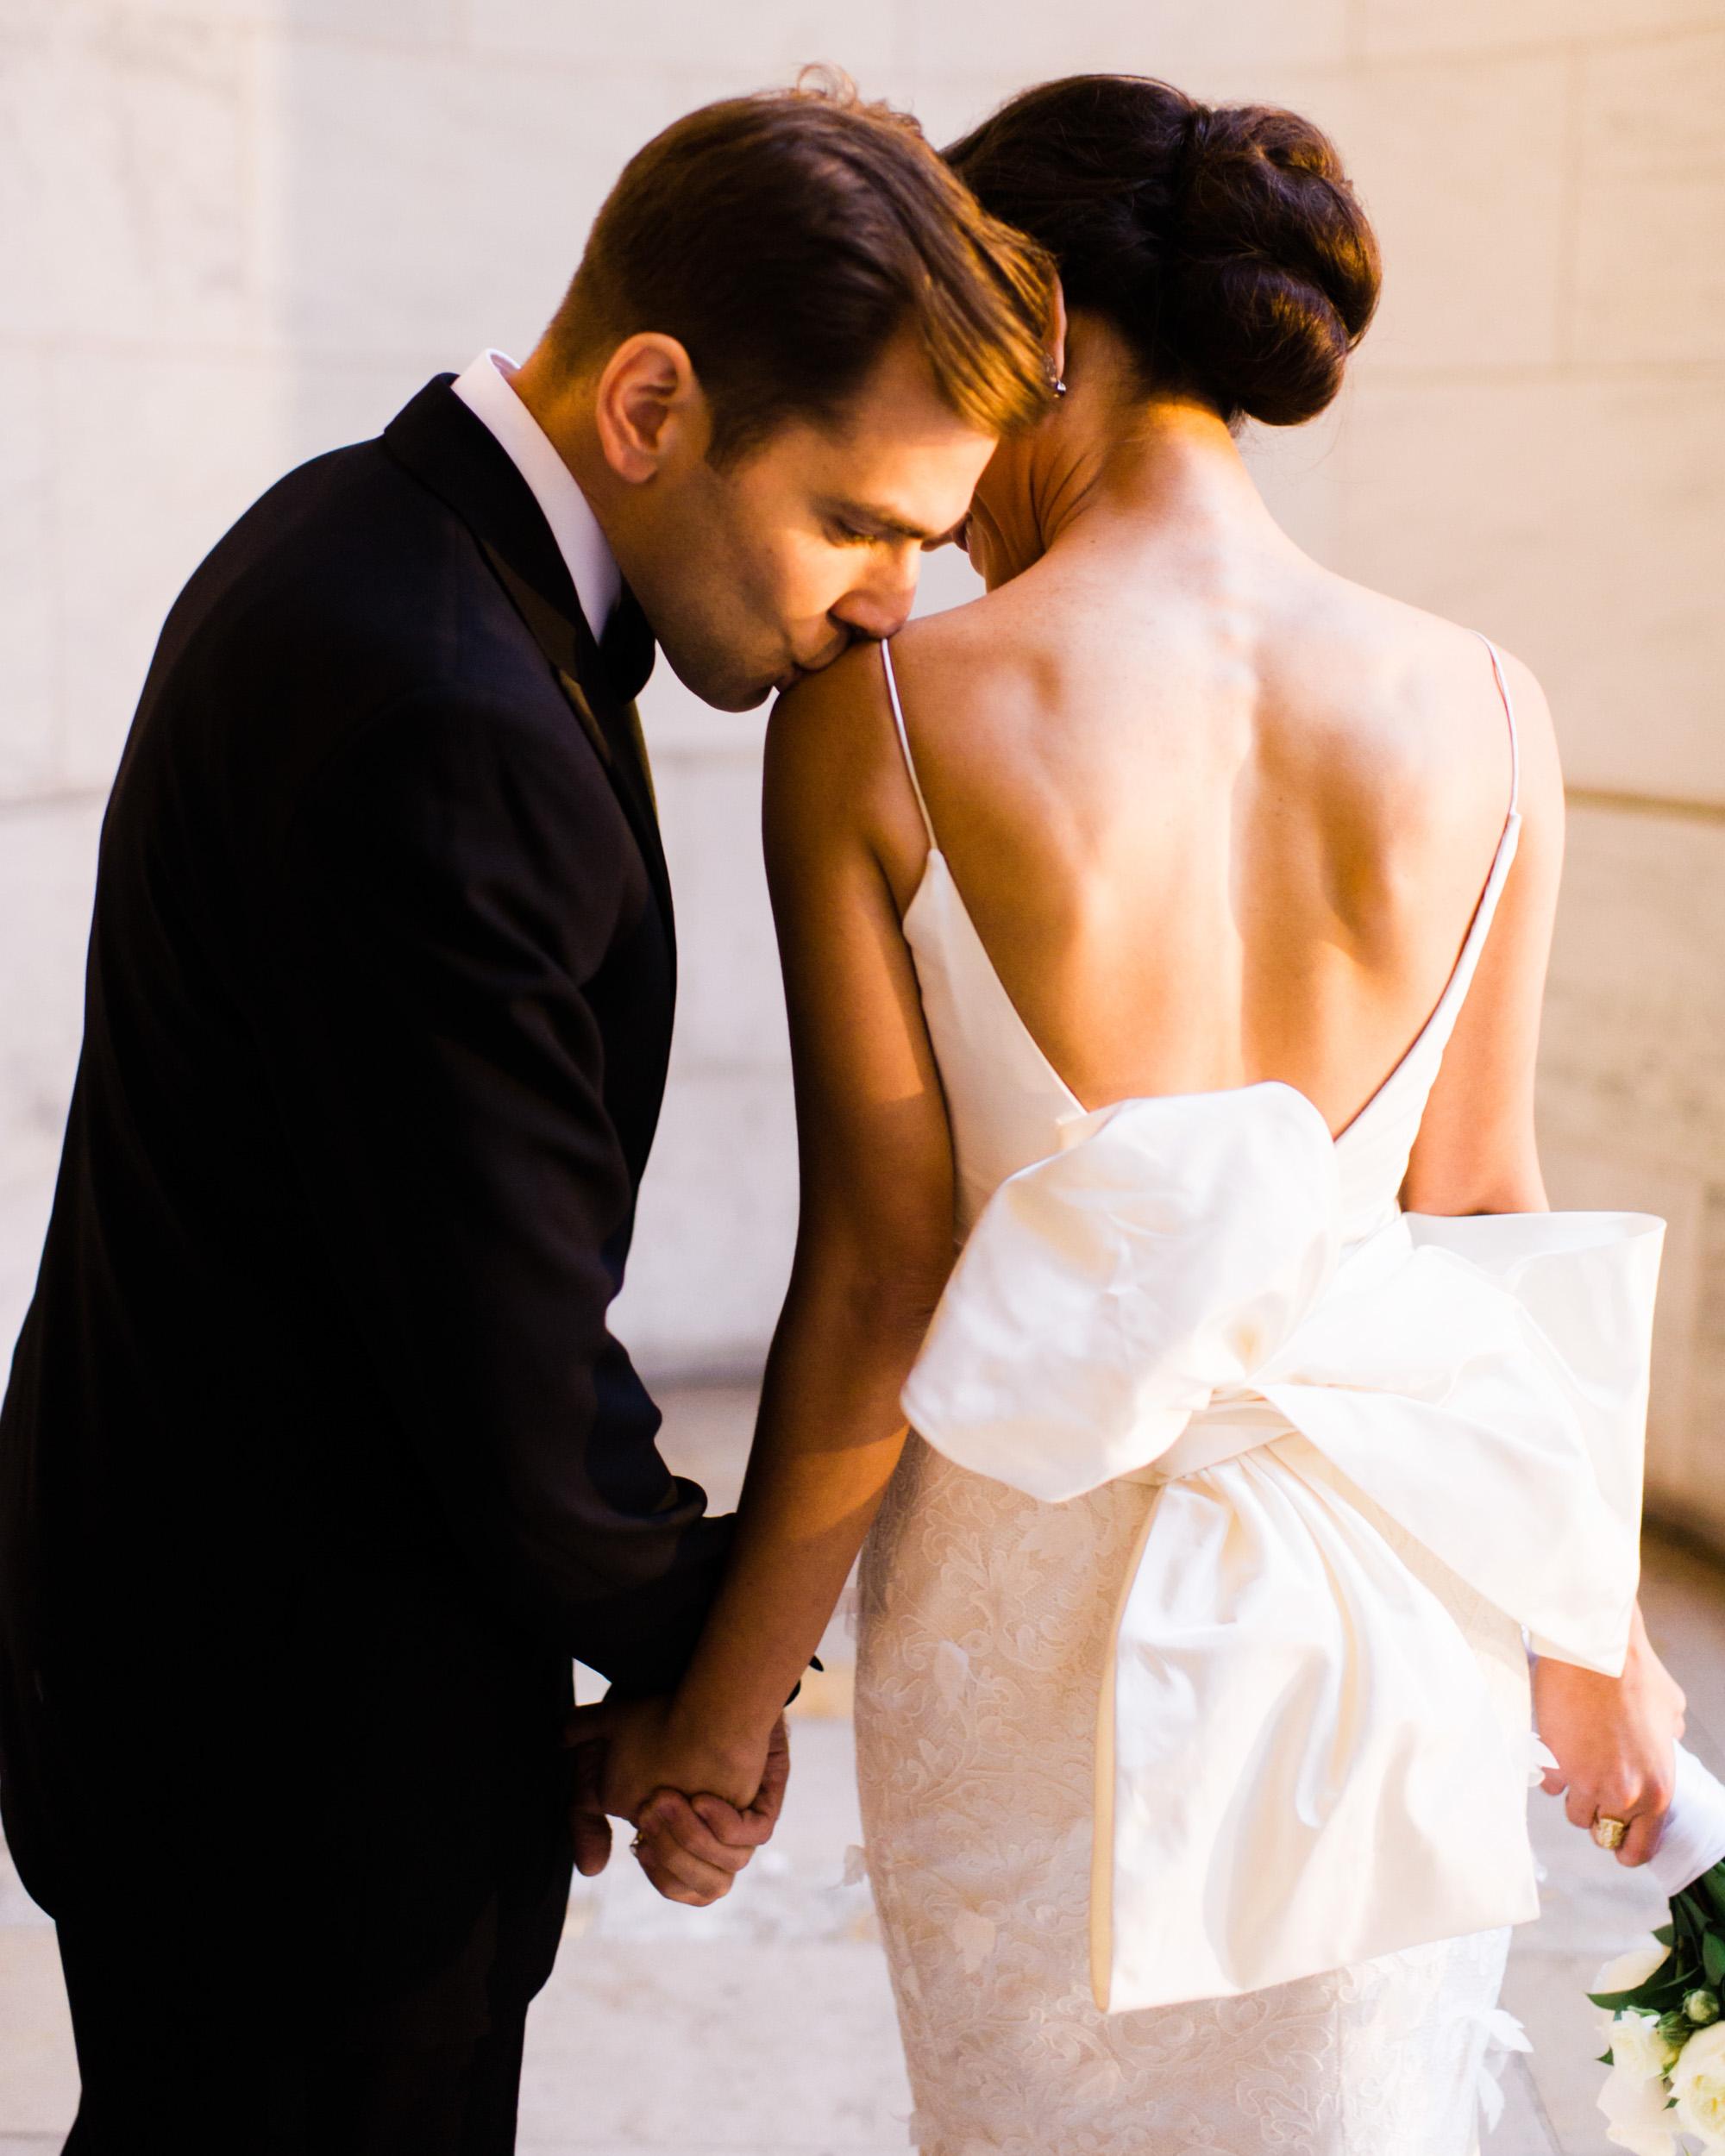 New York Public Library Wedding Photographer 80 - New York Public Library